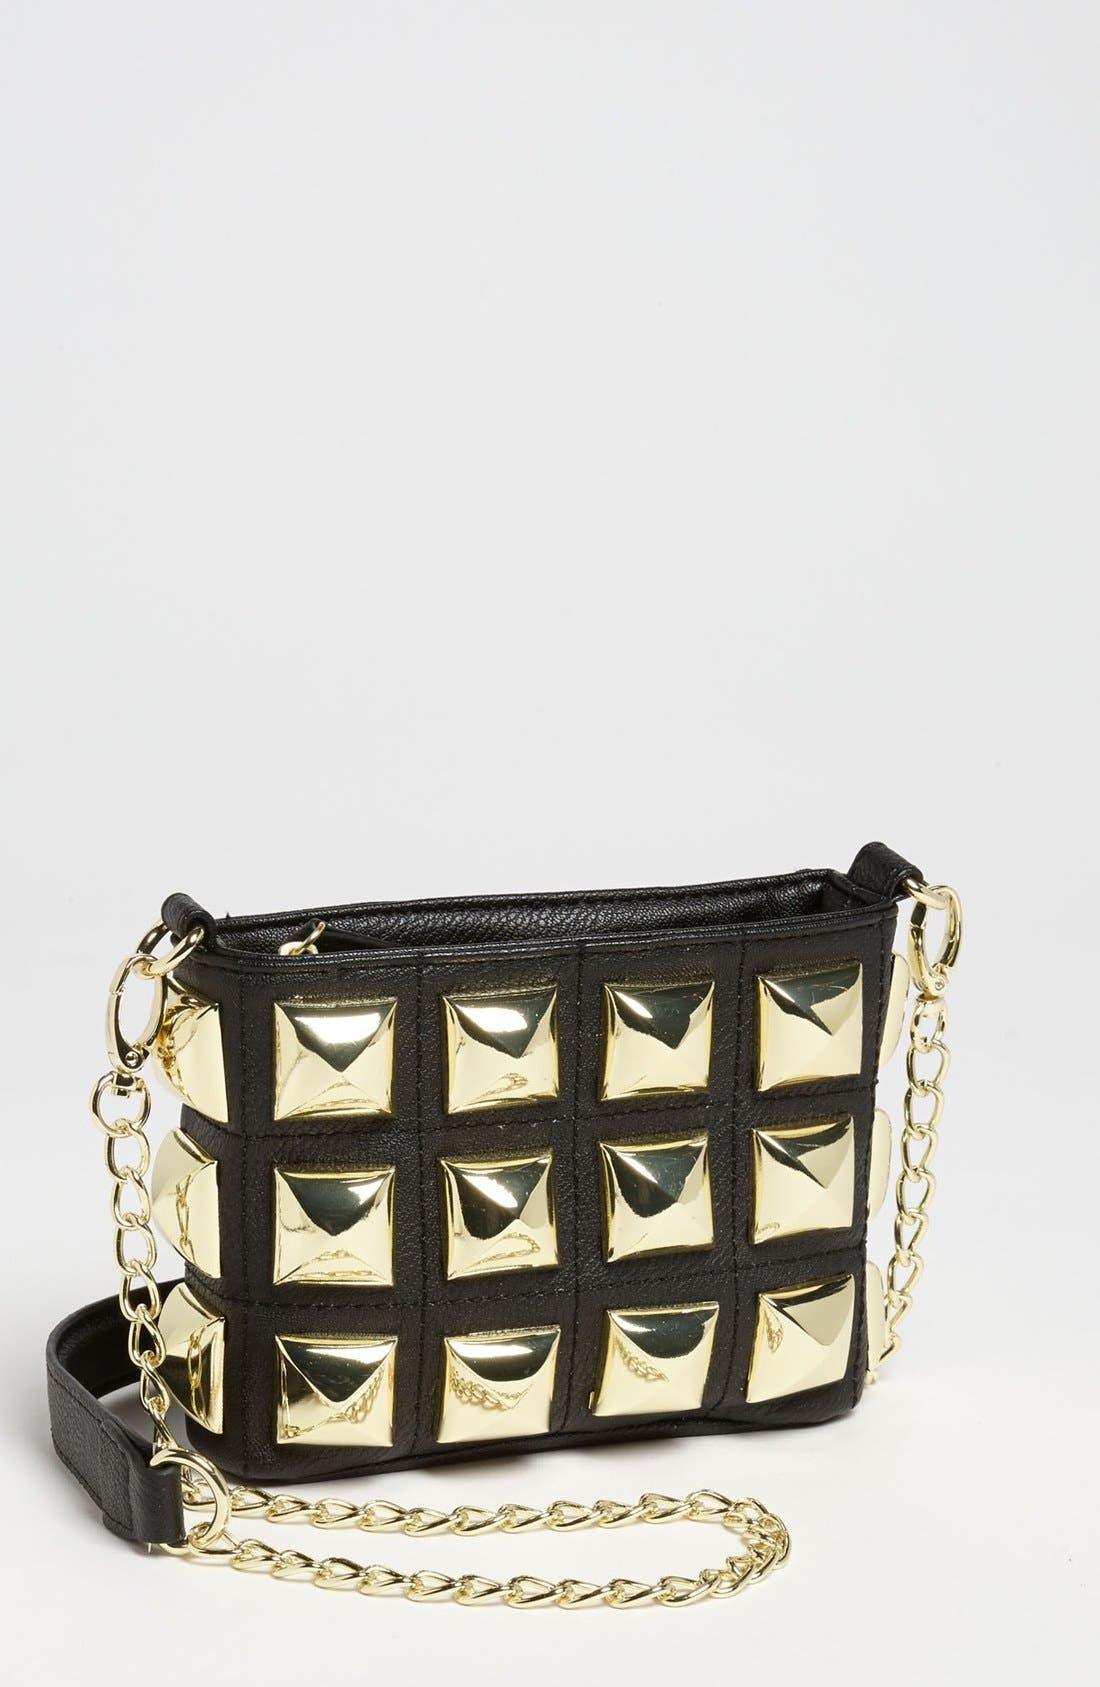 Alternate Image 1 Selected - Betsey Johnson 'Stud Muffin' Crossbody Bag